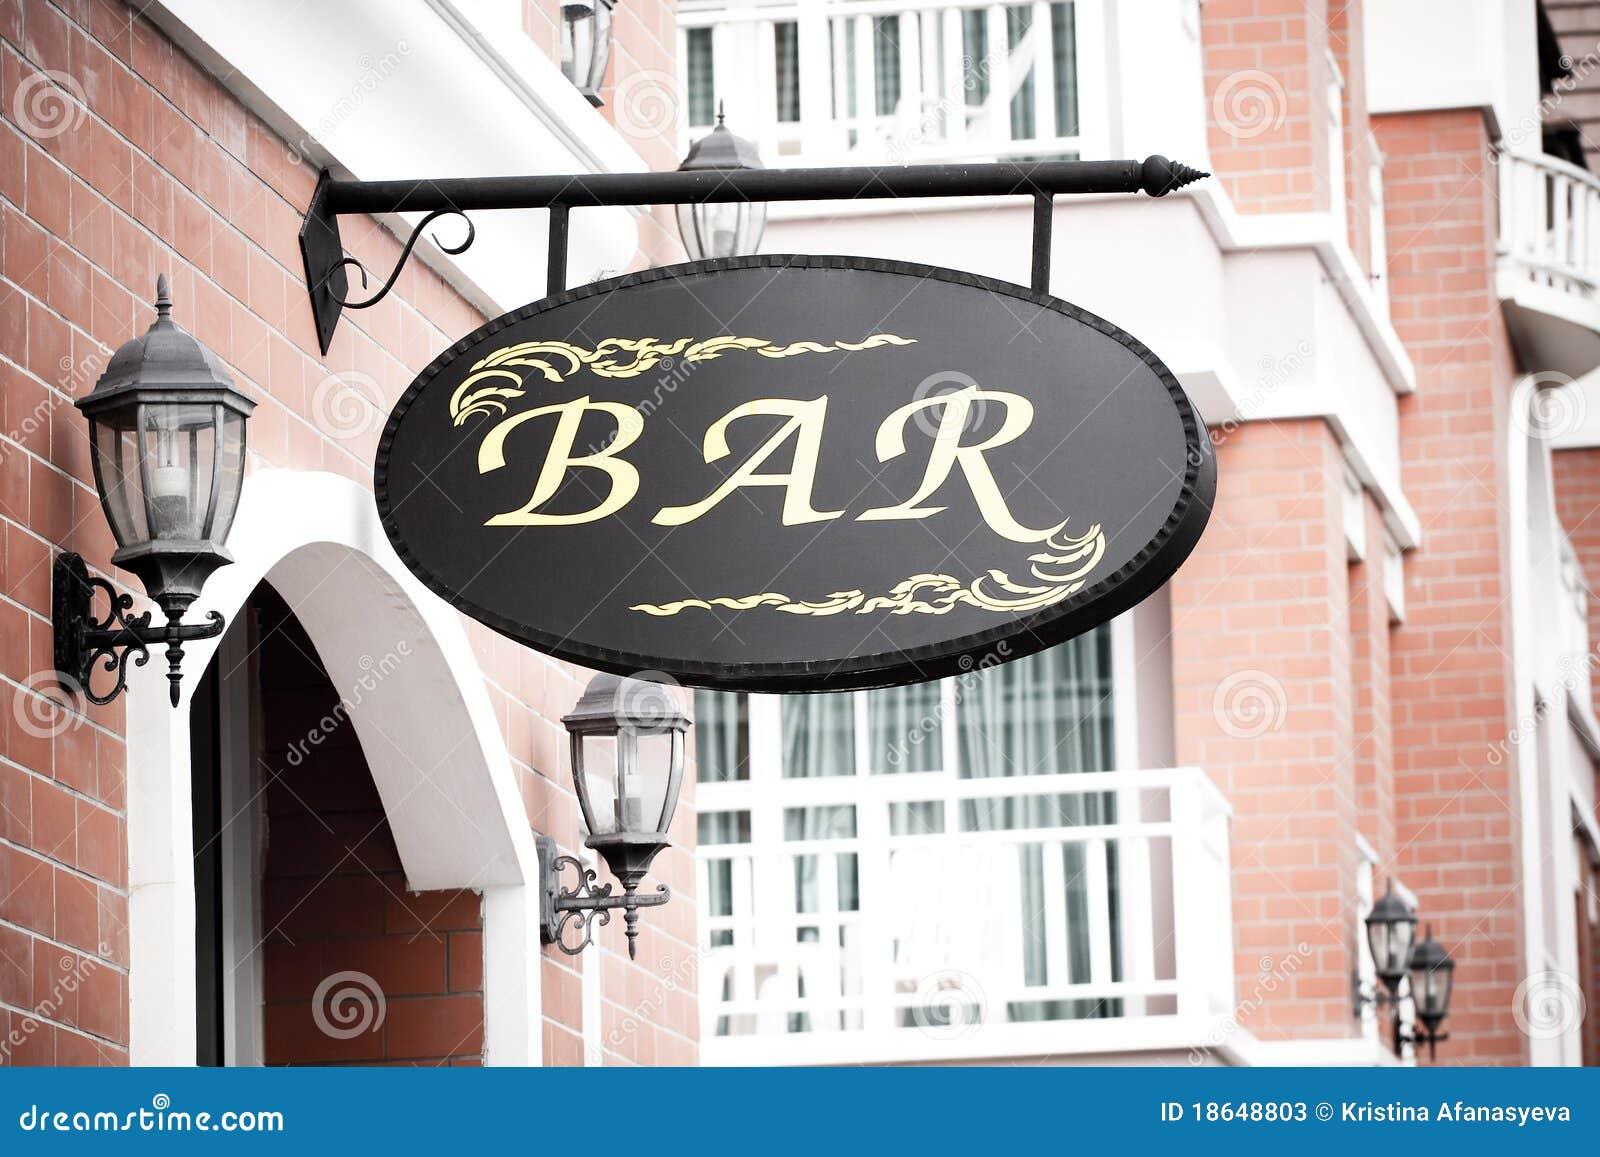 Download Bar sign stock image. Image of advert, booze, grunge - 18648803